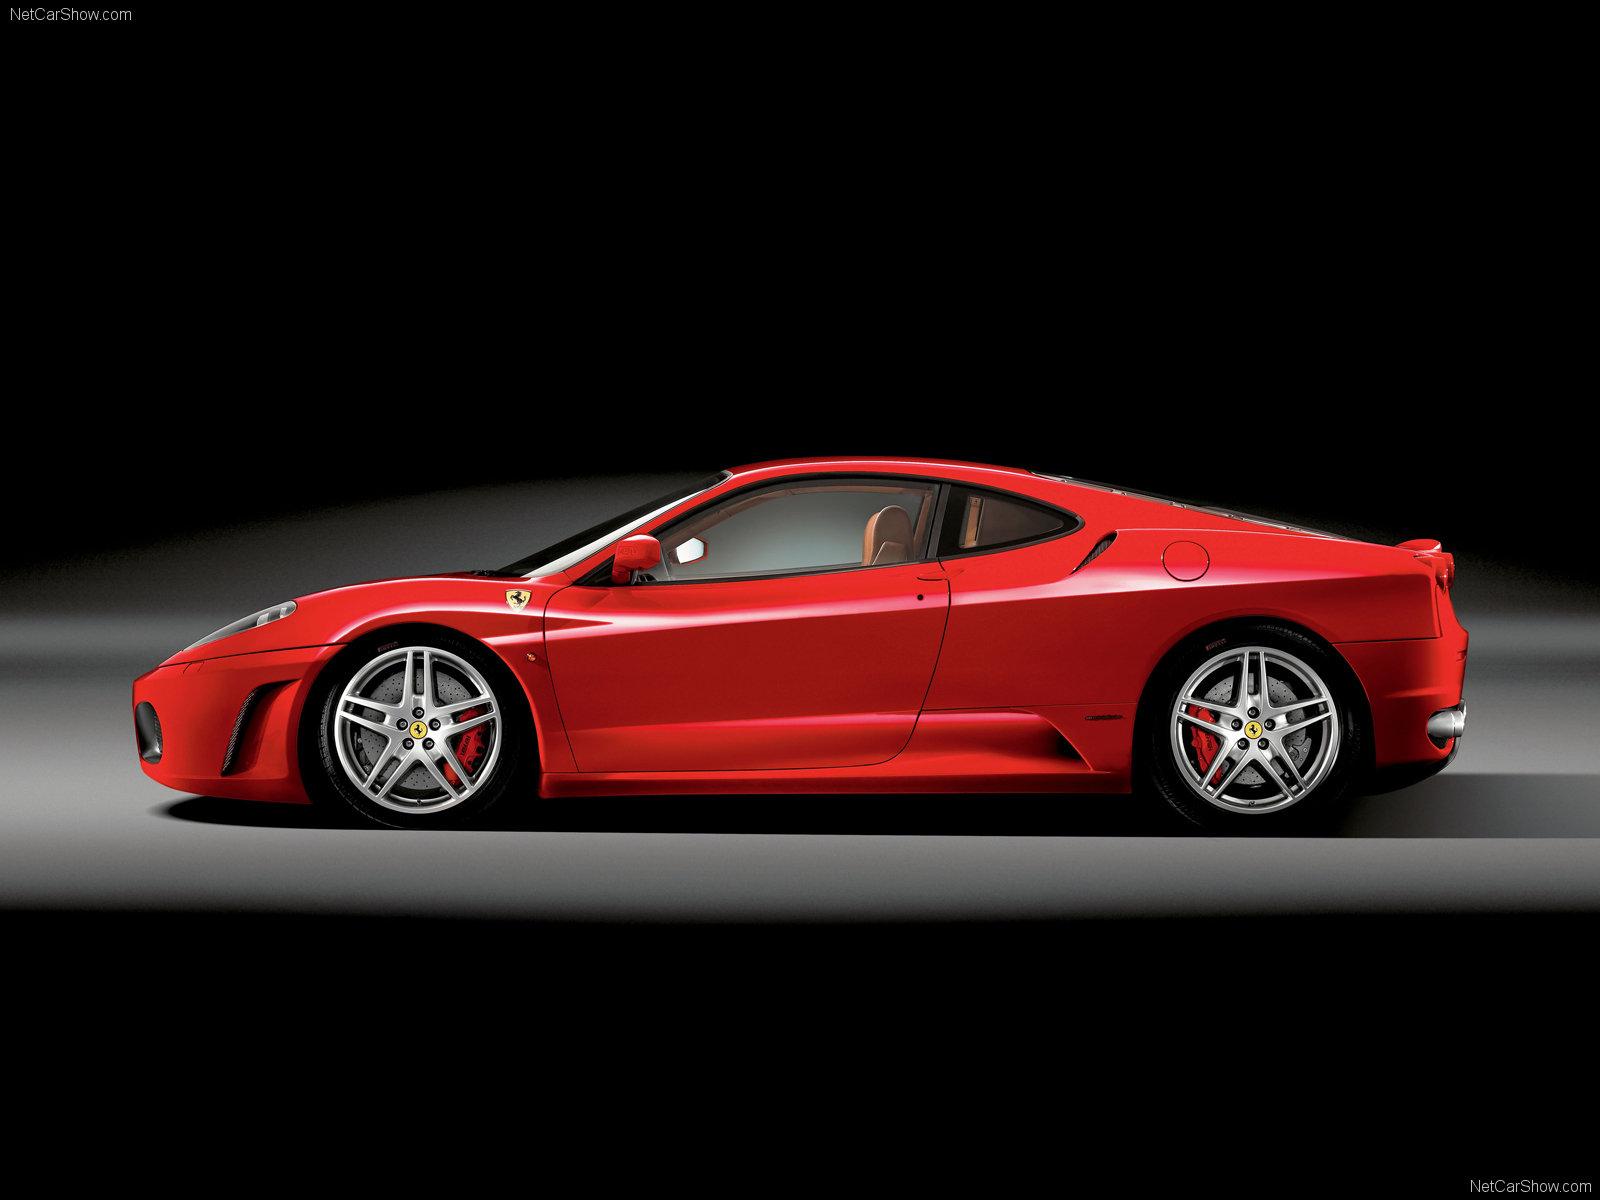 Ferrari f430 car free wallpapers new